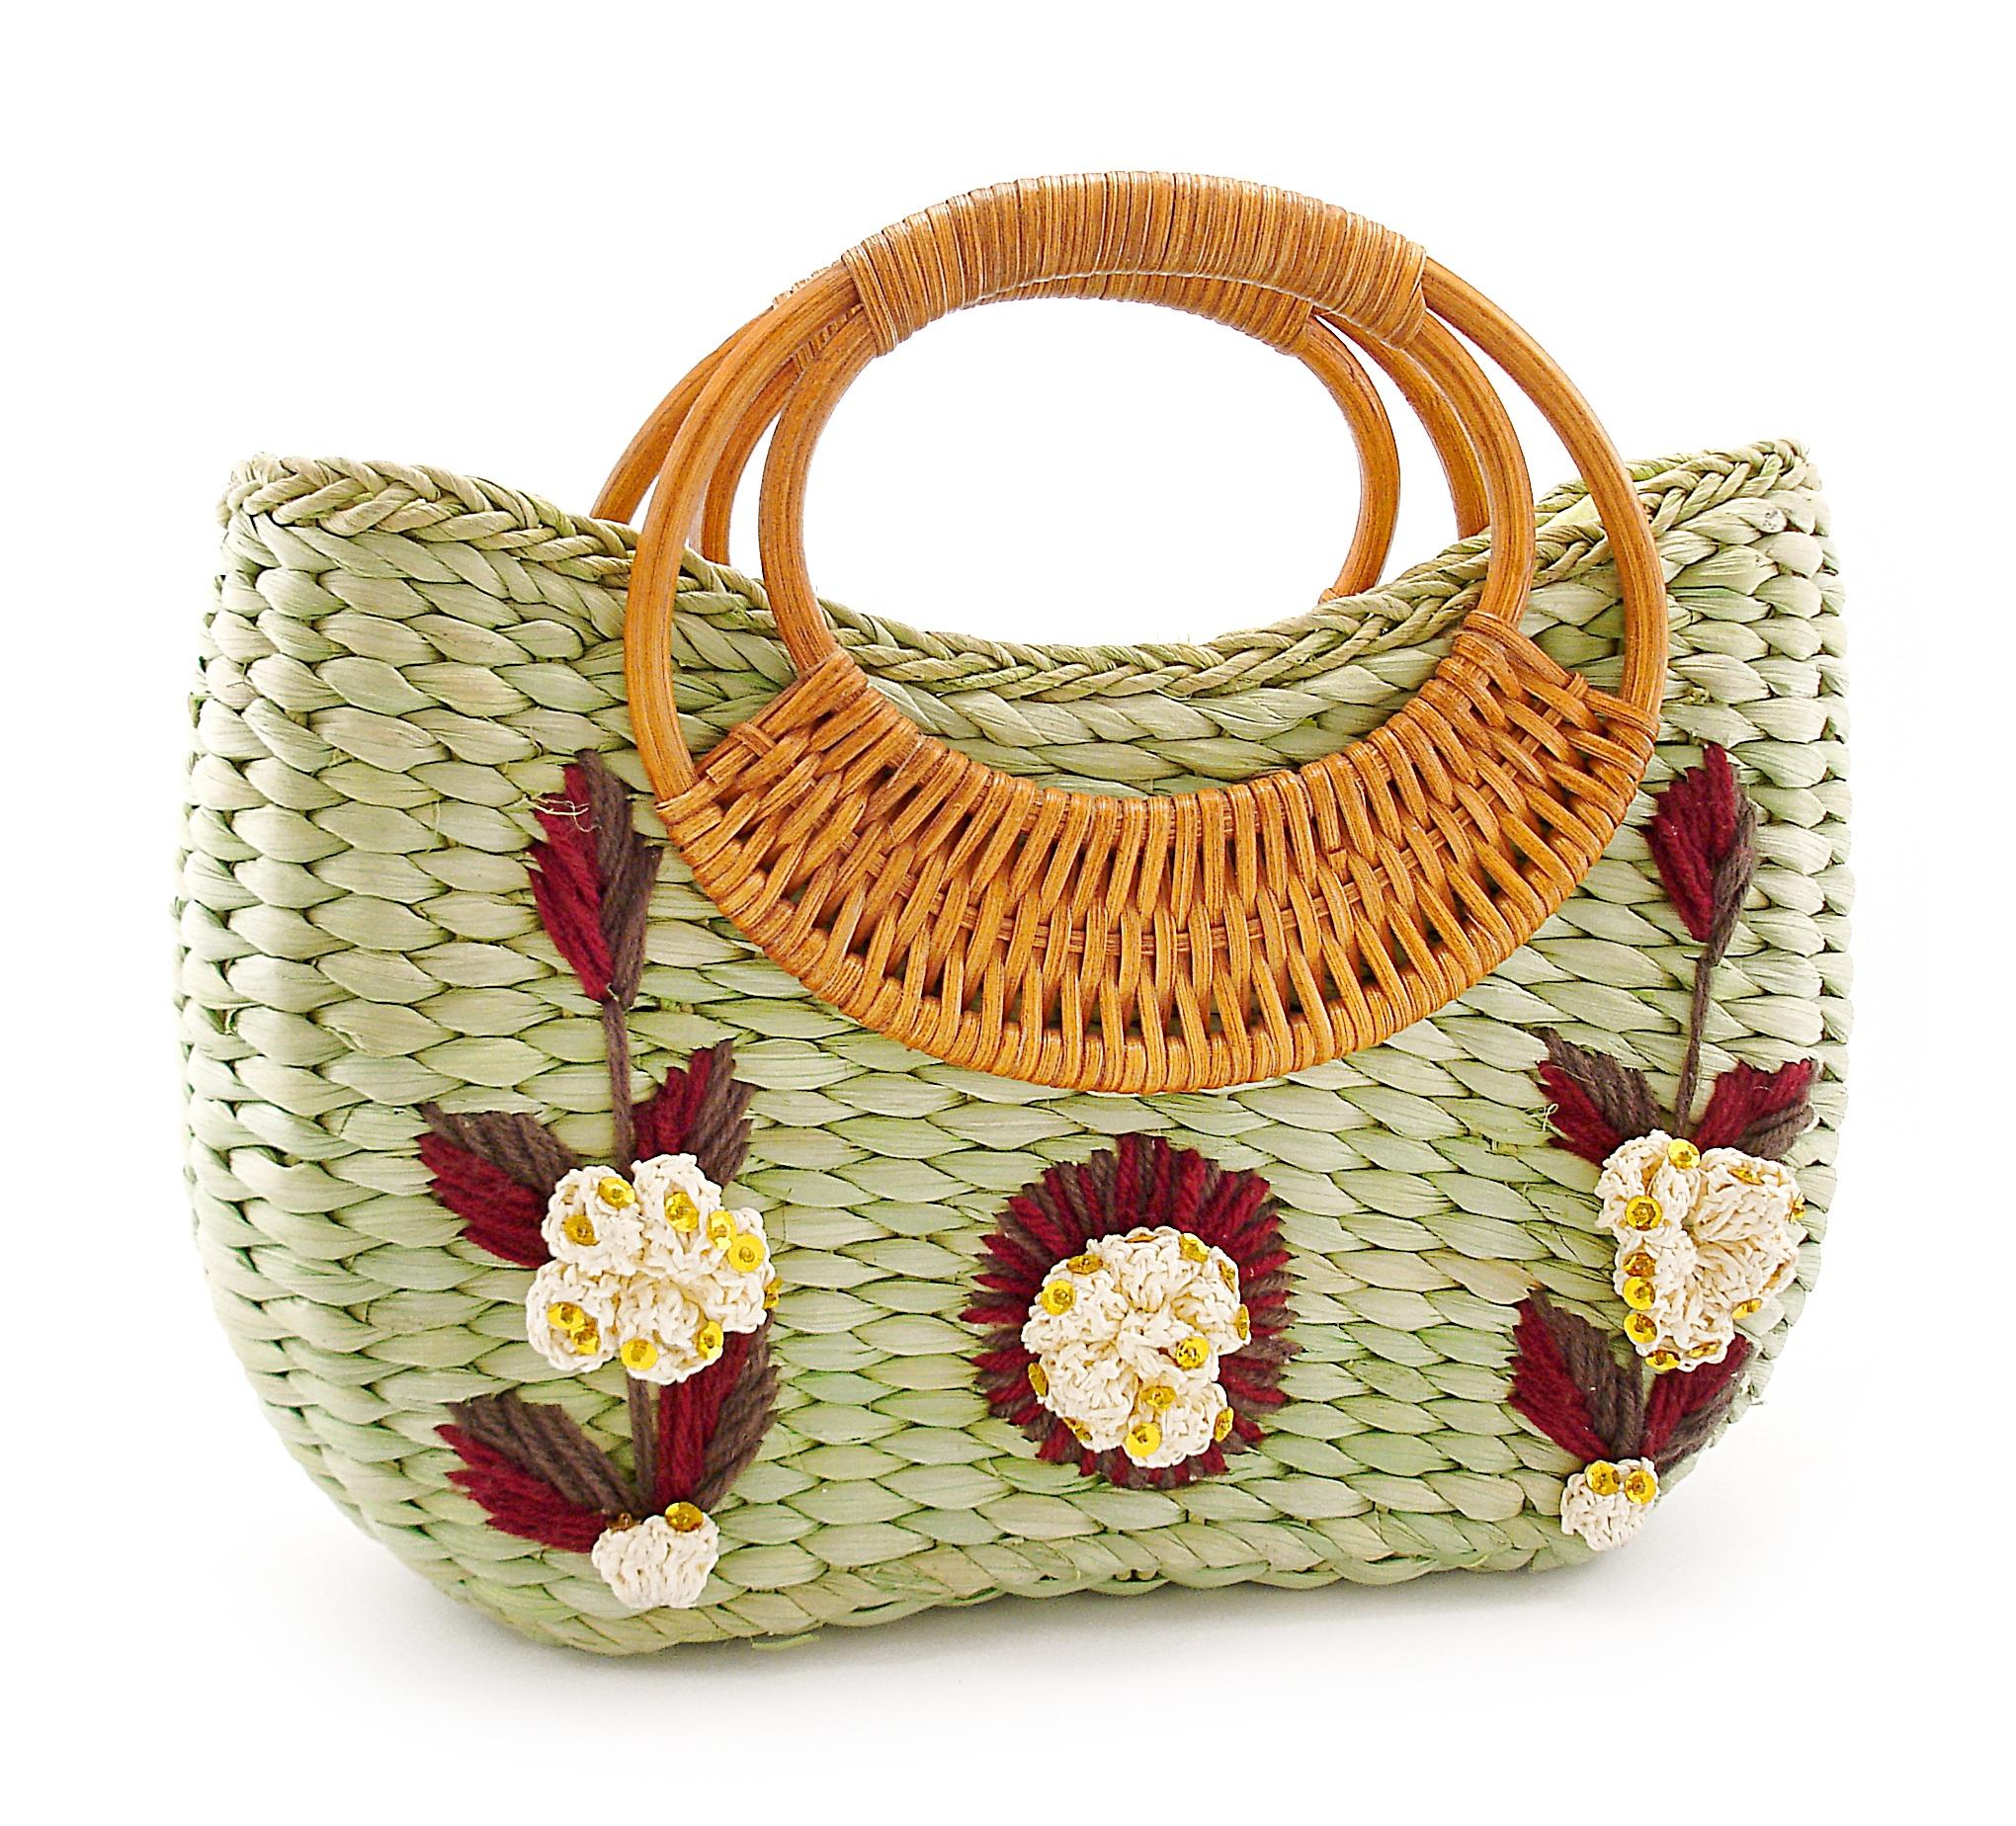 Fotos gratis : mujer, heno, patrón, bolso, tejer, textil, art, oro ...